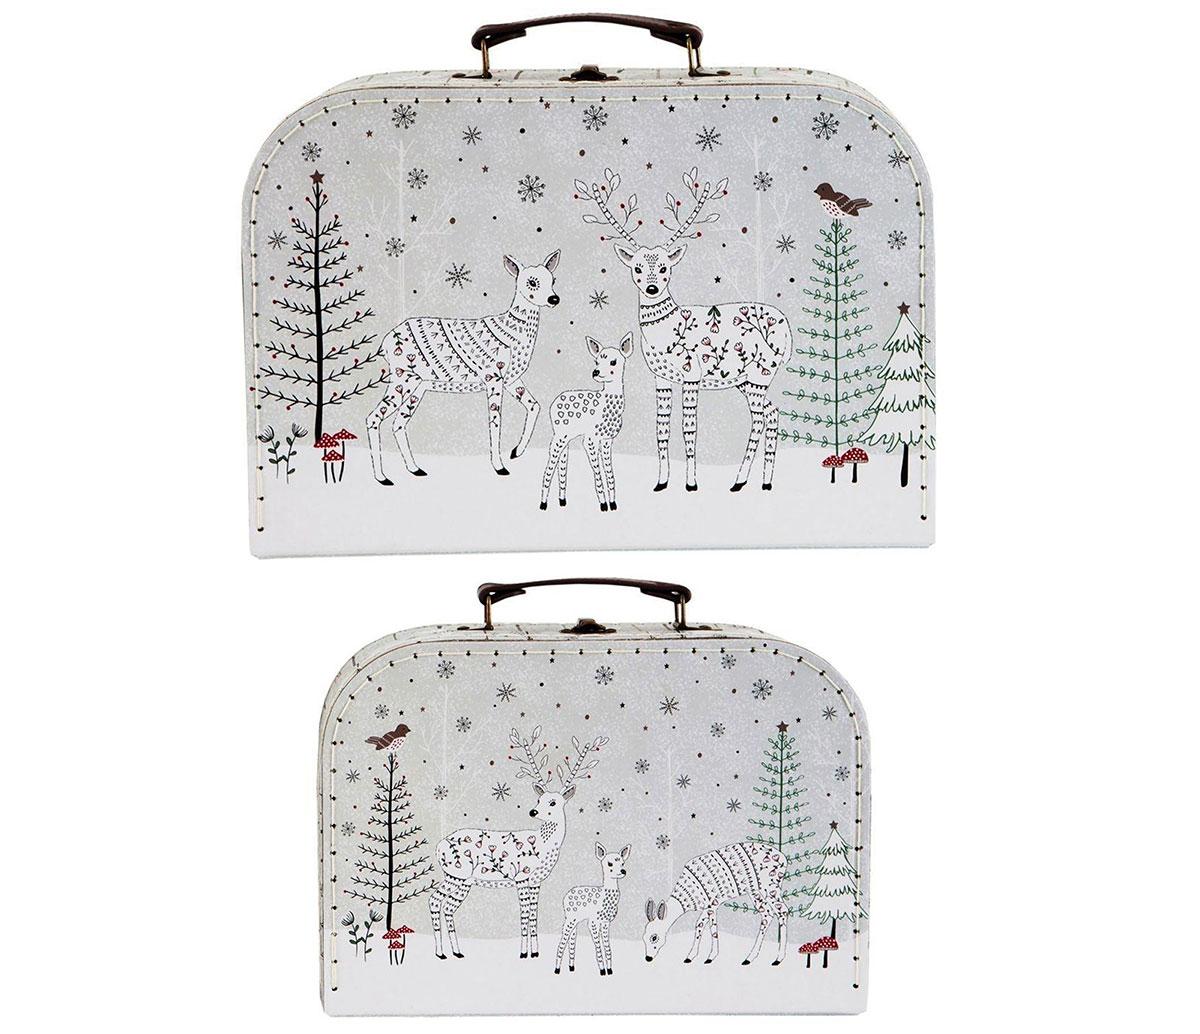 detské kufríky so zimným motívom jeleňov